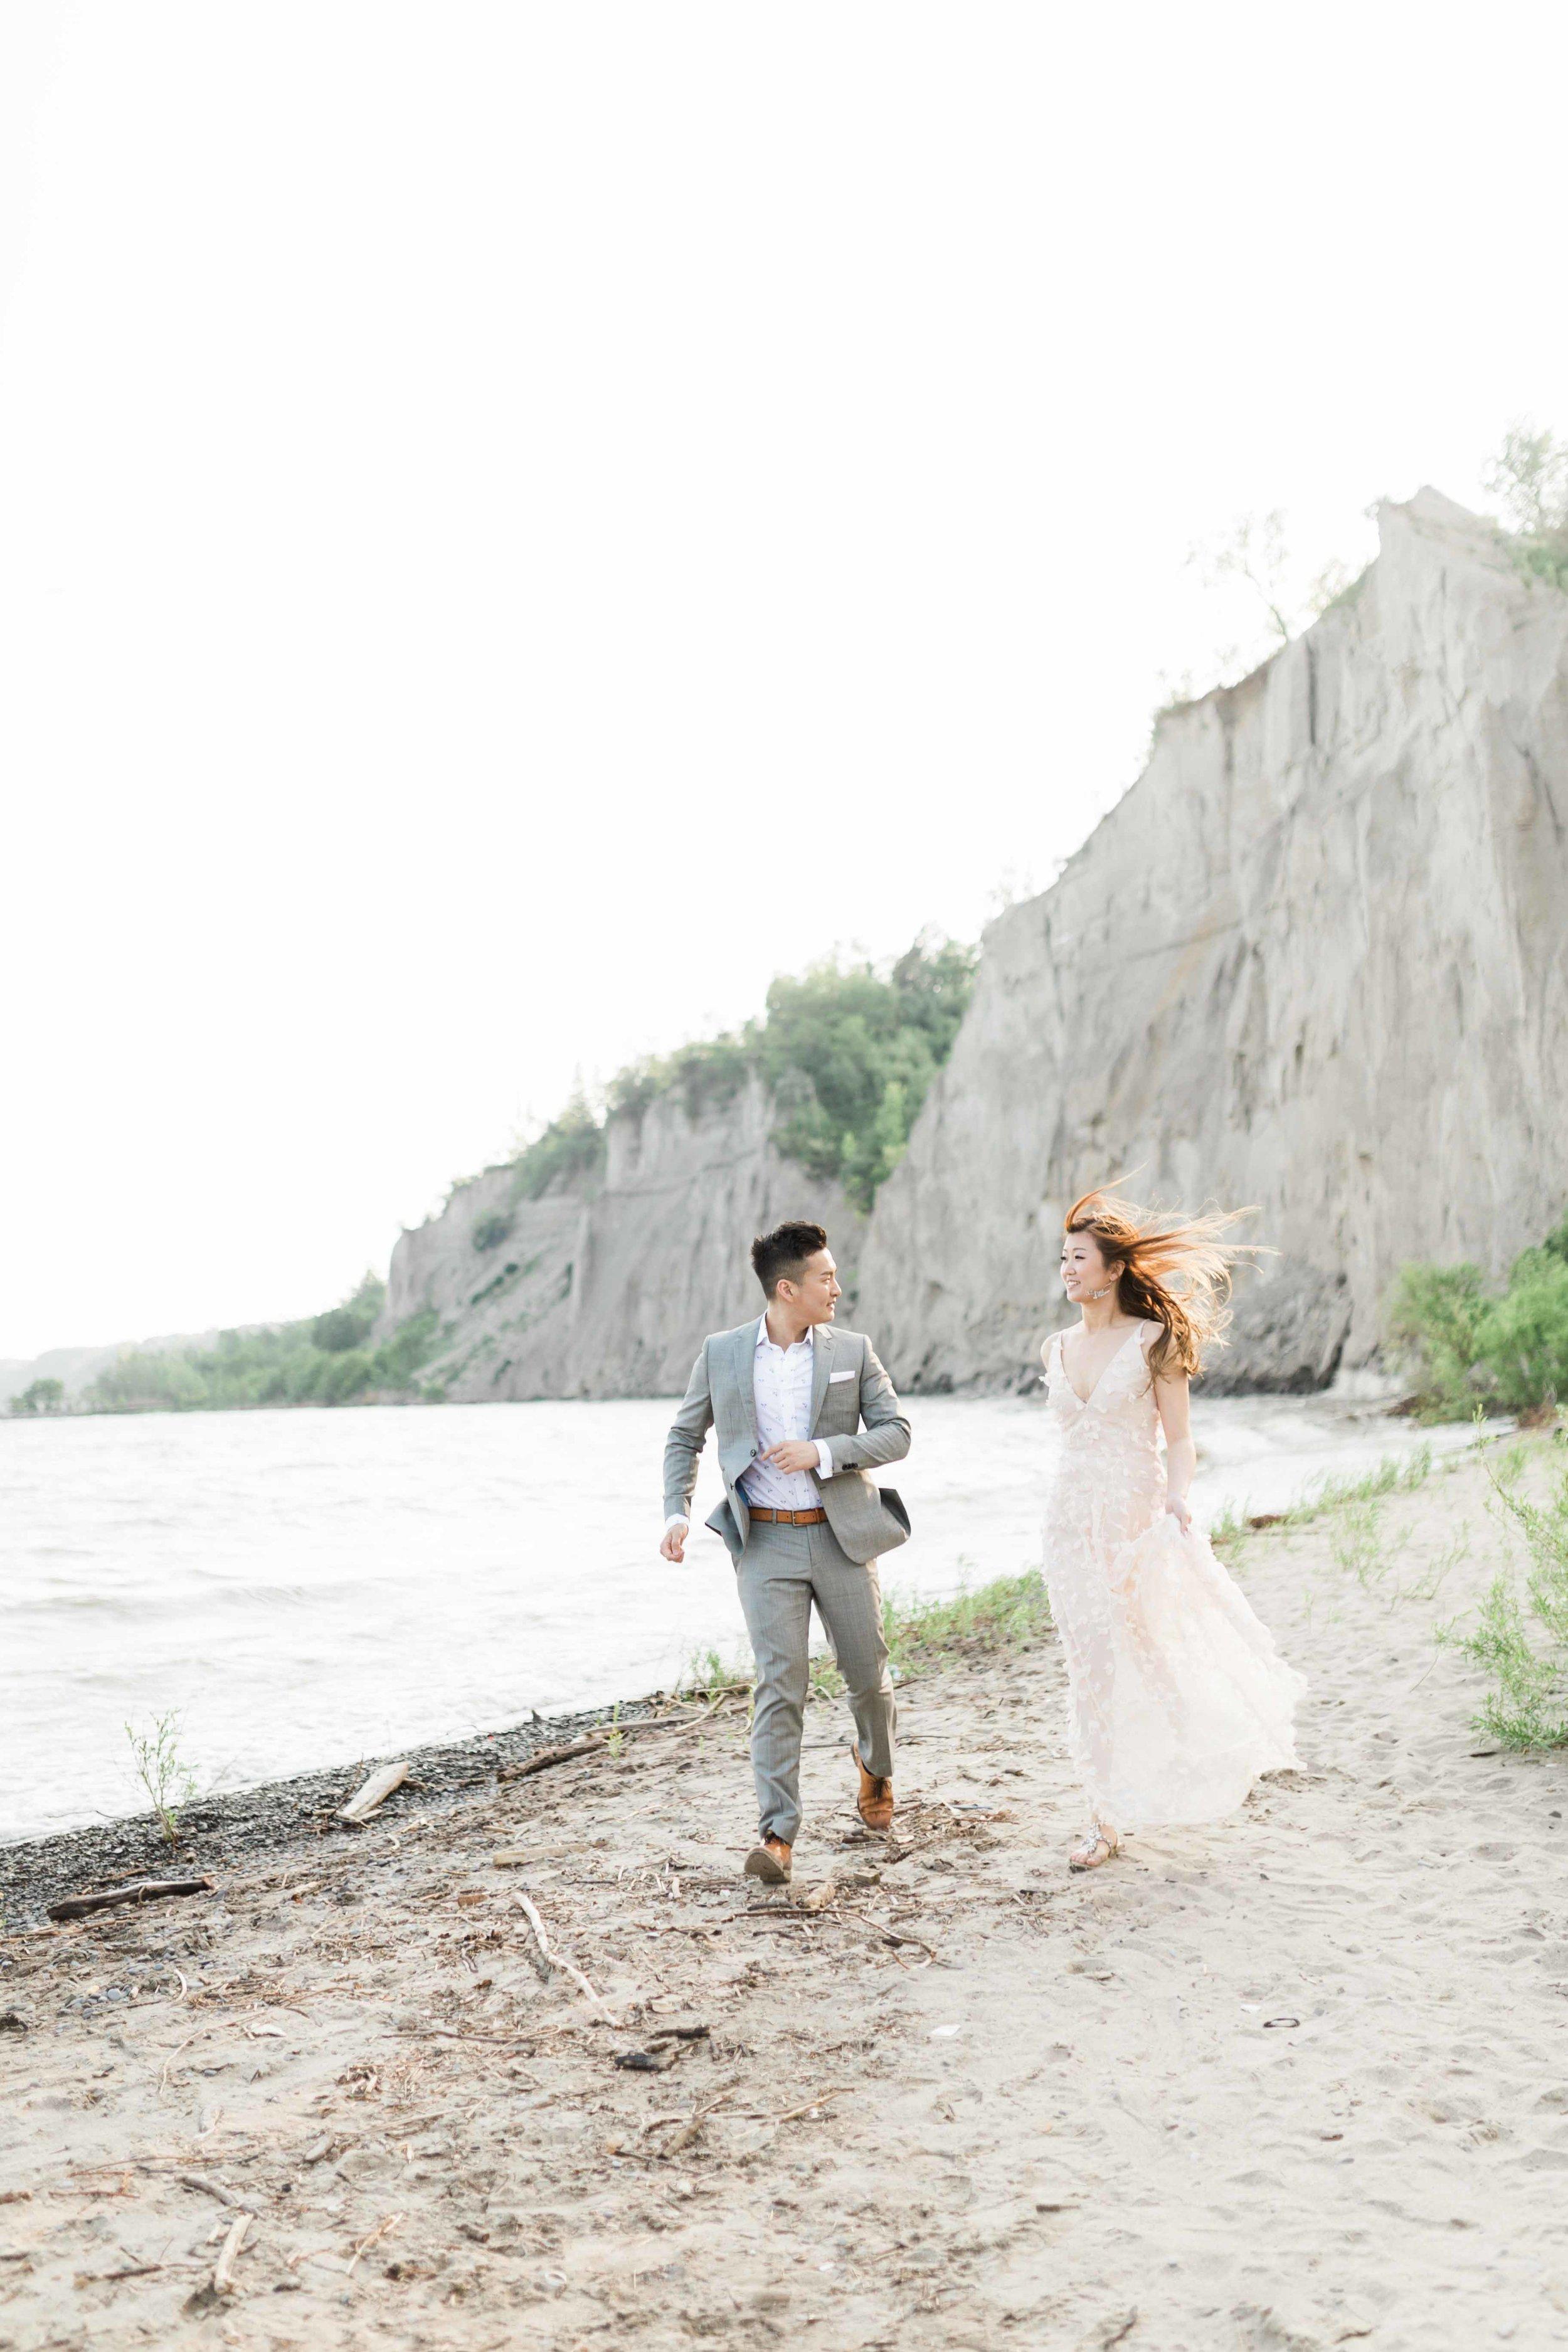 Cari Zhu Fine Art Photographer - Scarborough Bluffs Engagement Session-16.jpg